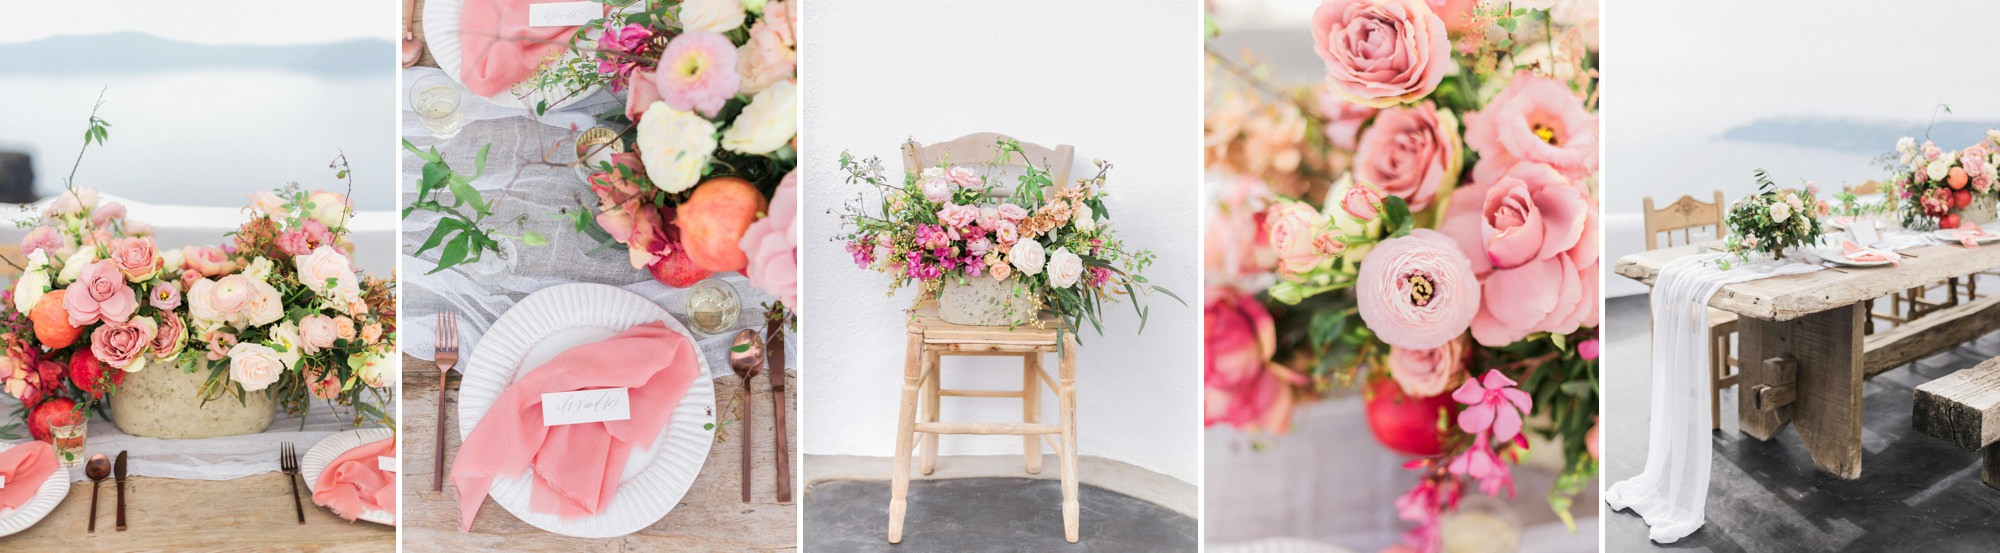 top wedding photography ideas in Greece